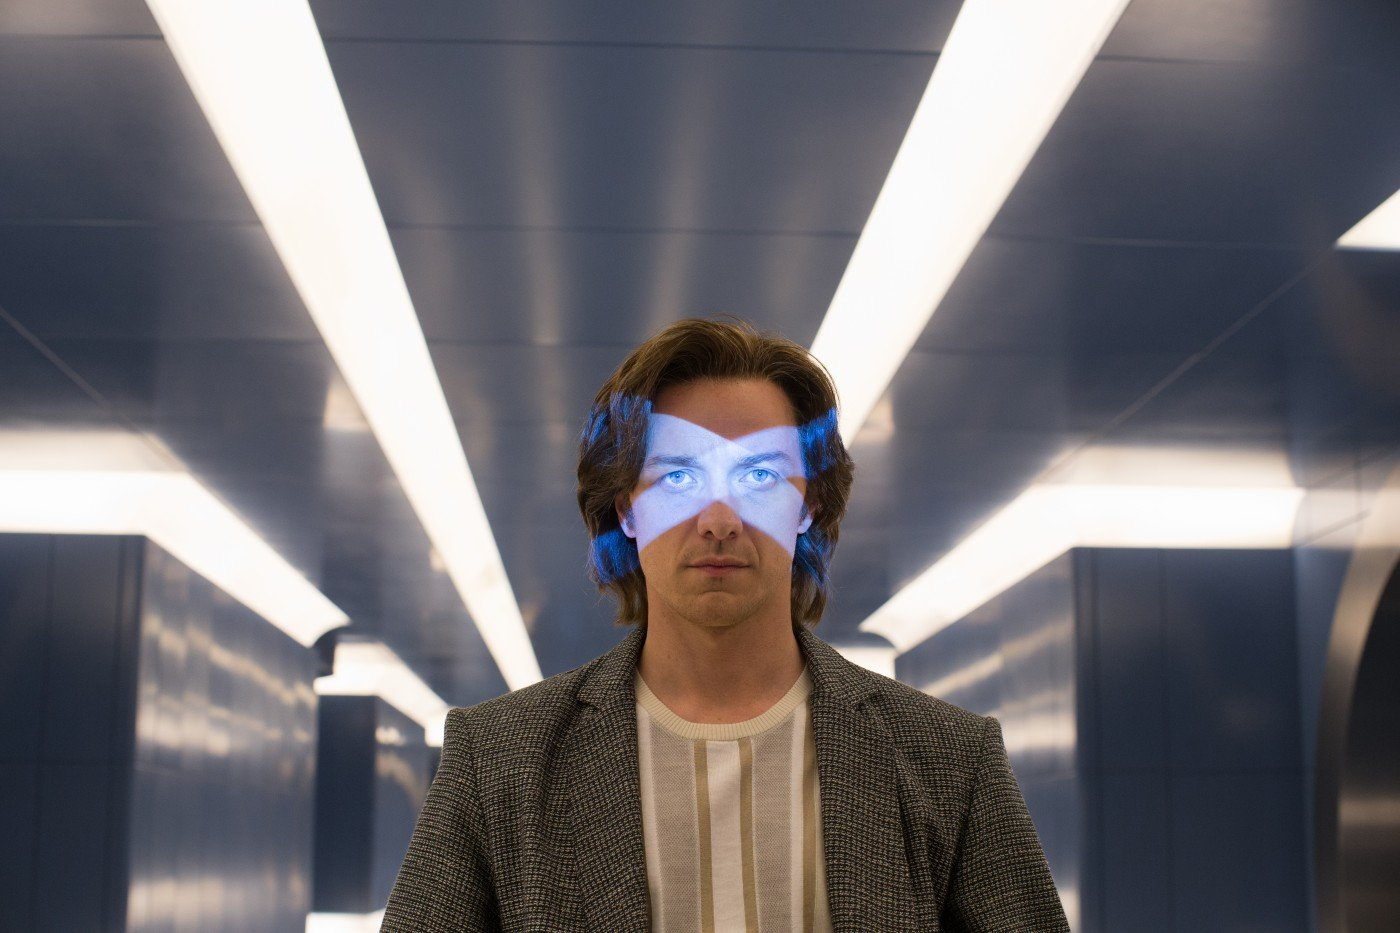 Charles Xavier - Professor X (James McAvoy)